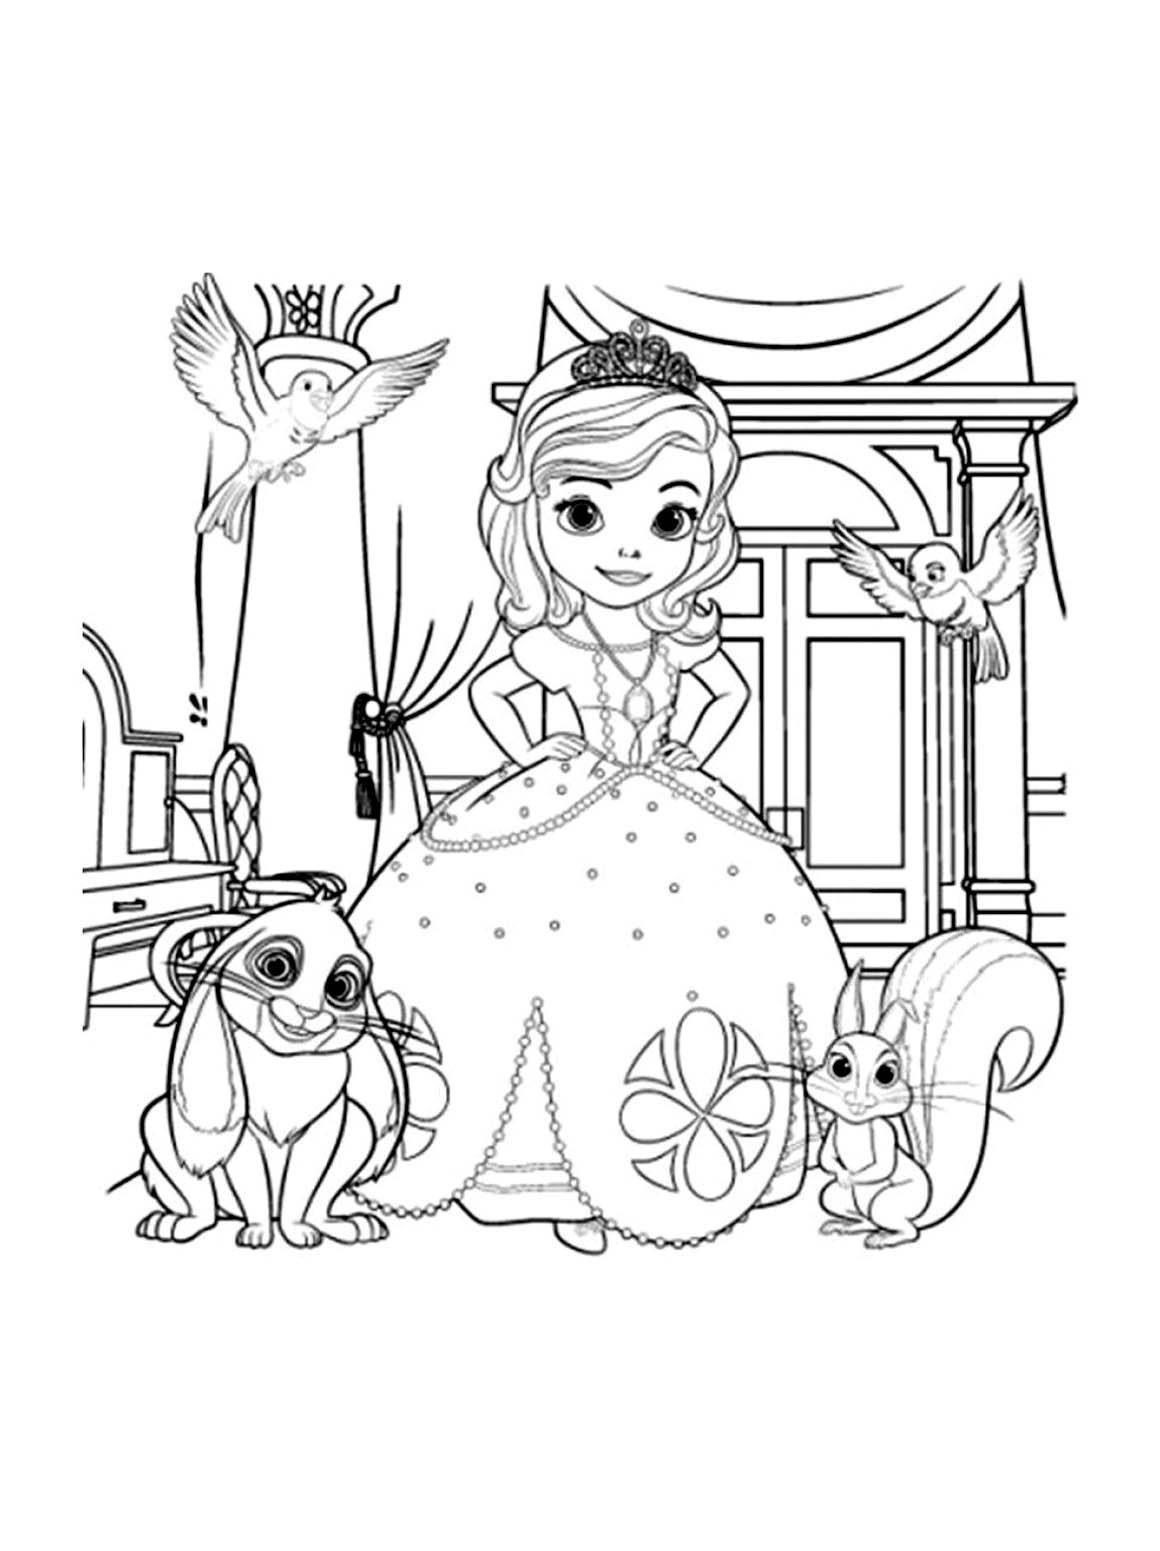 princes sofia free to color for kids sofia the first free